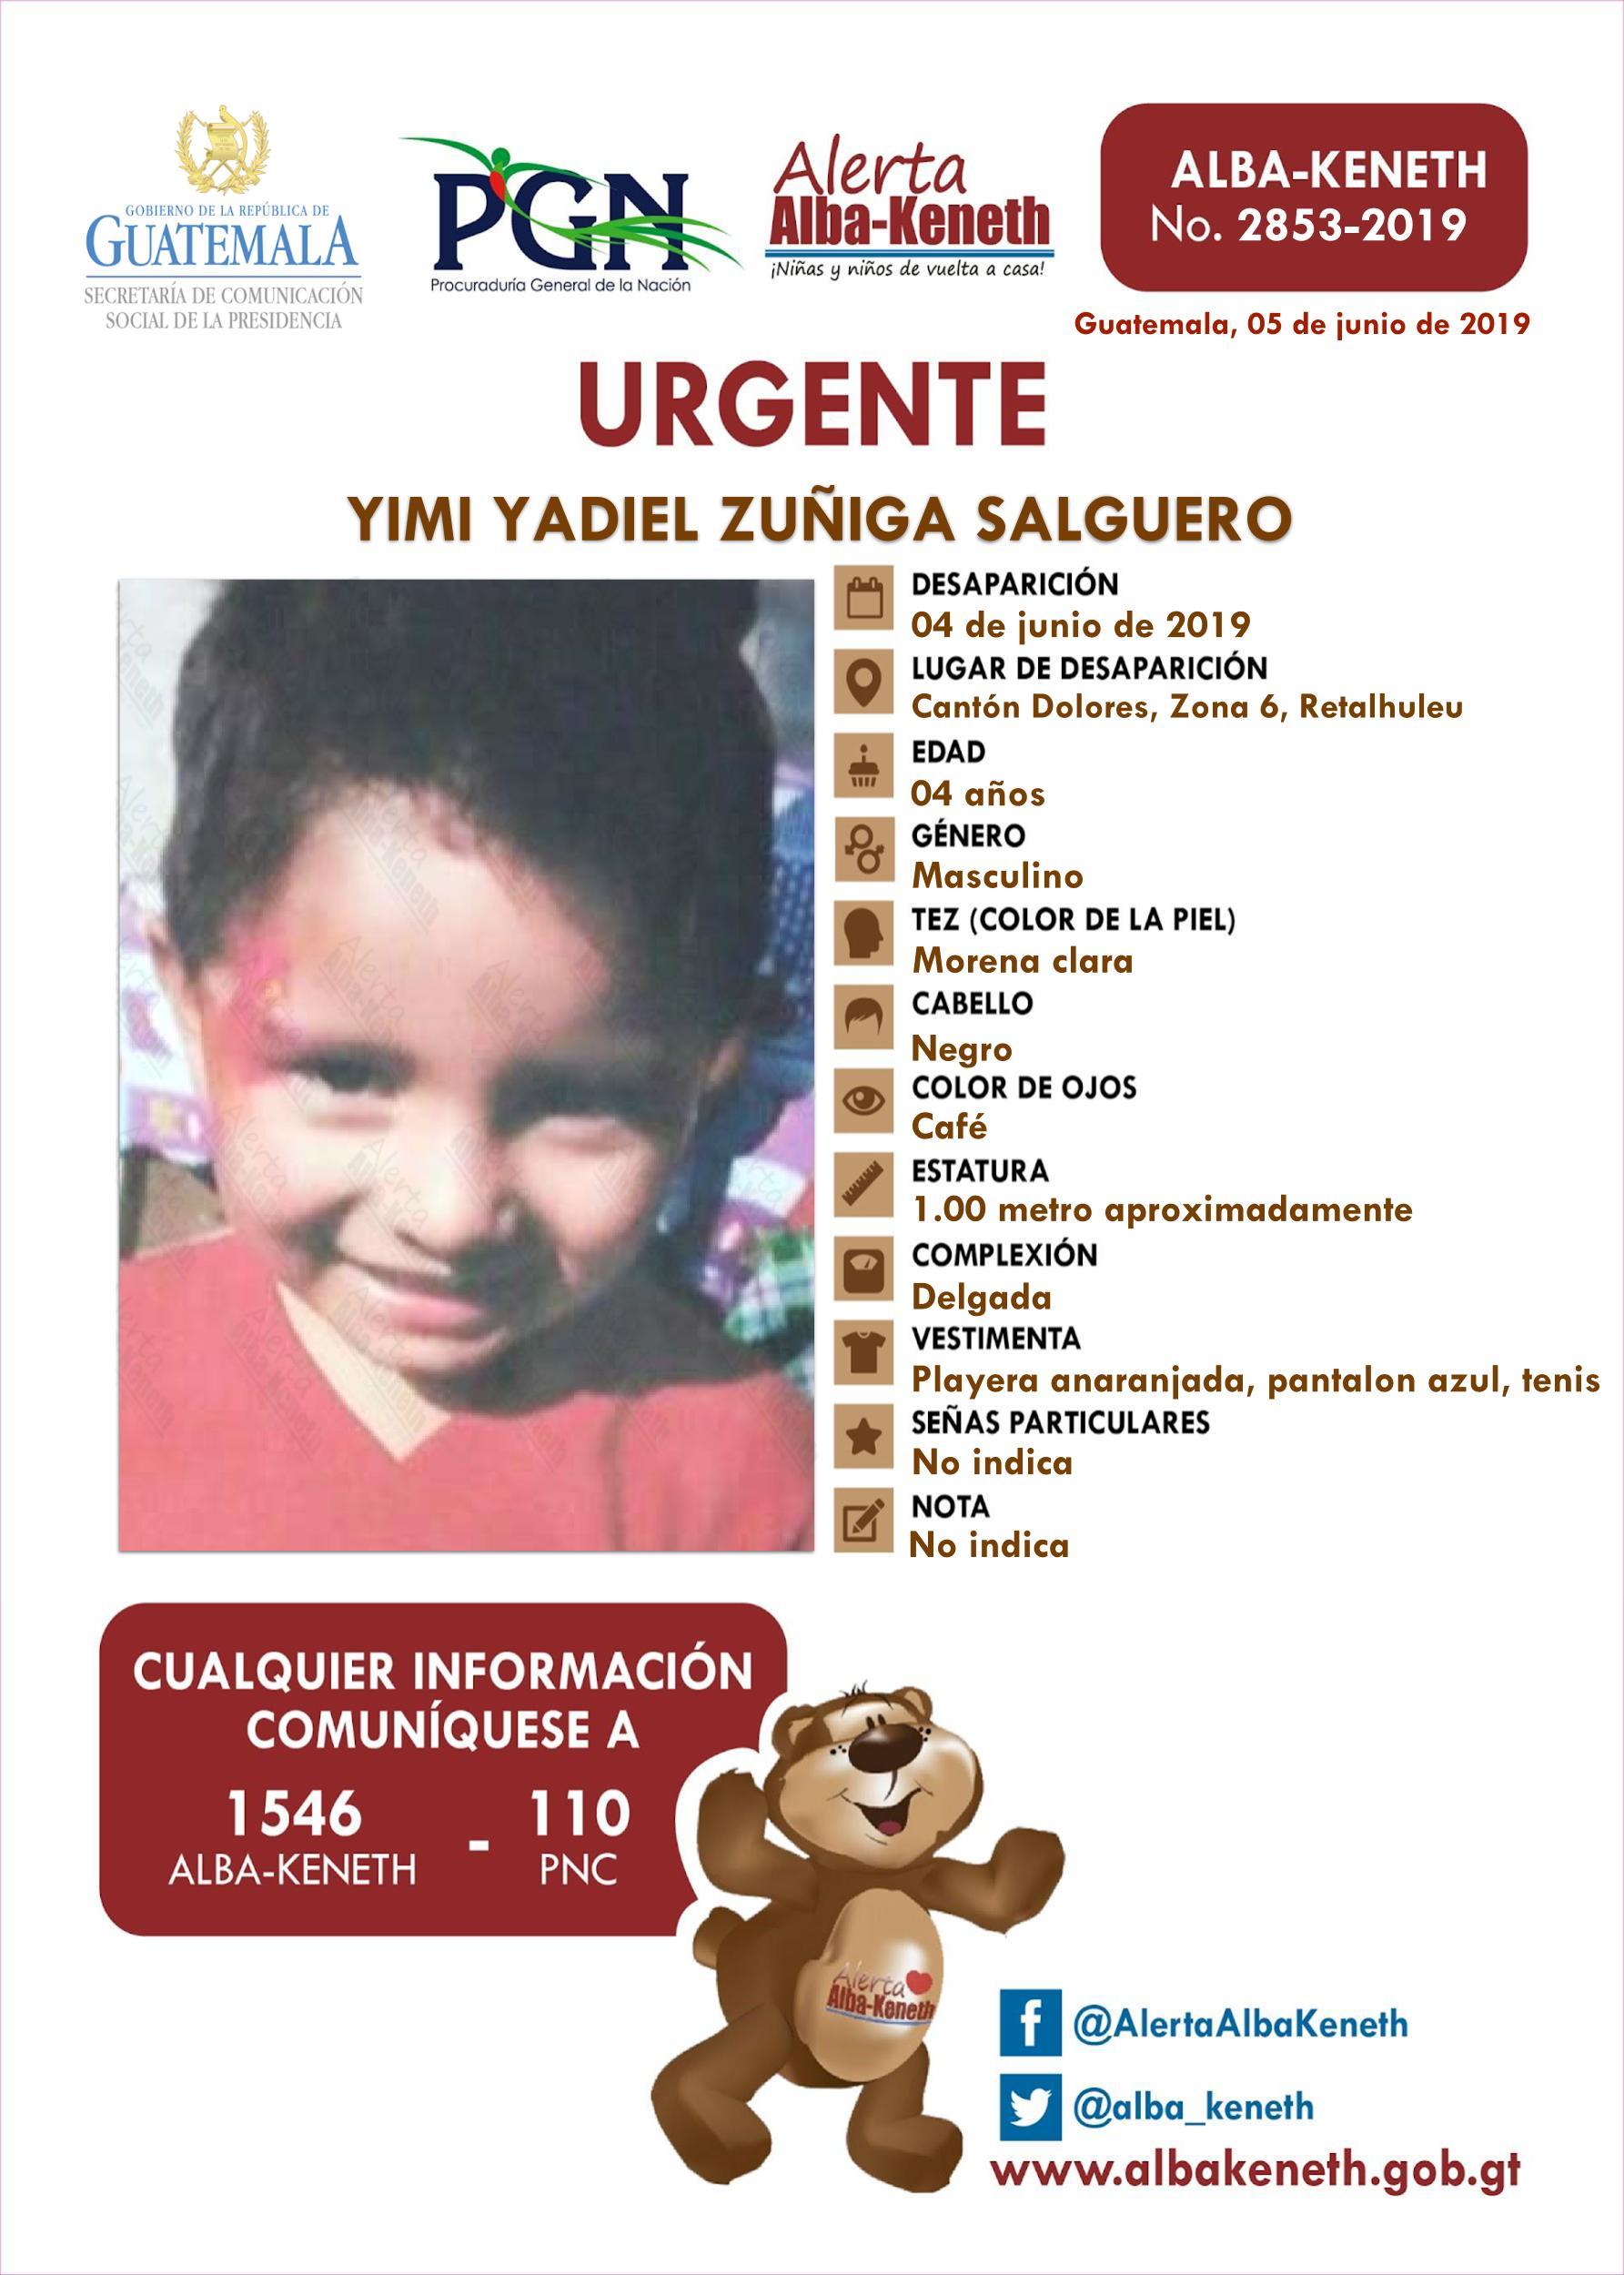 Yimi Yadiel Zuñiga Salguero